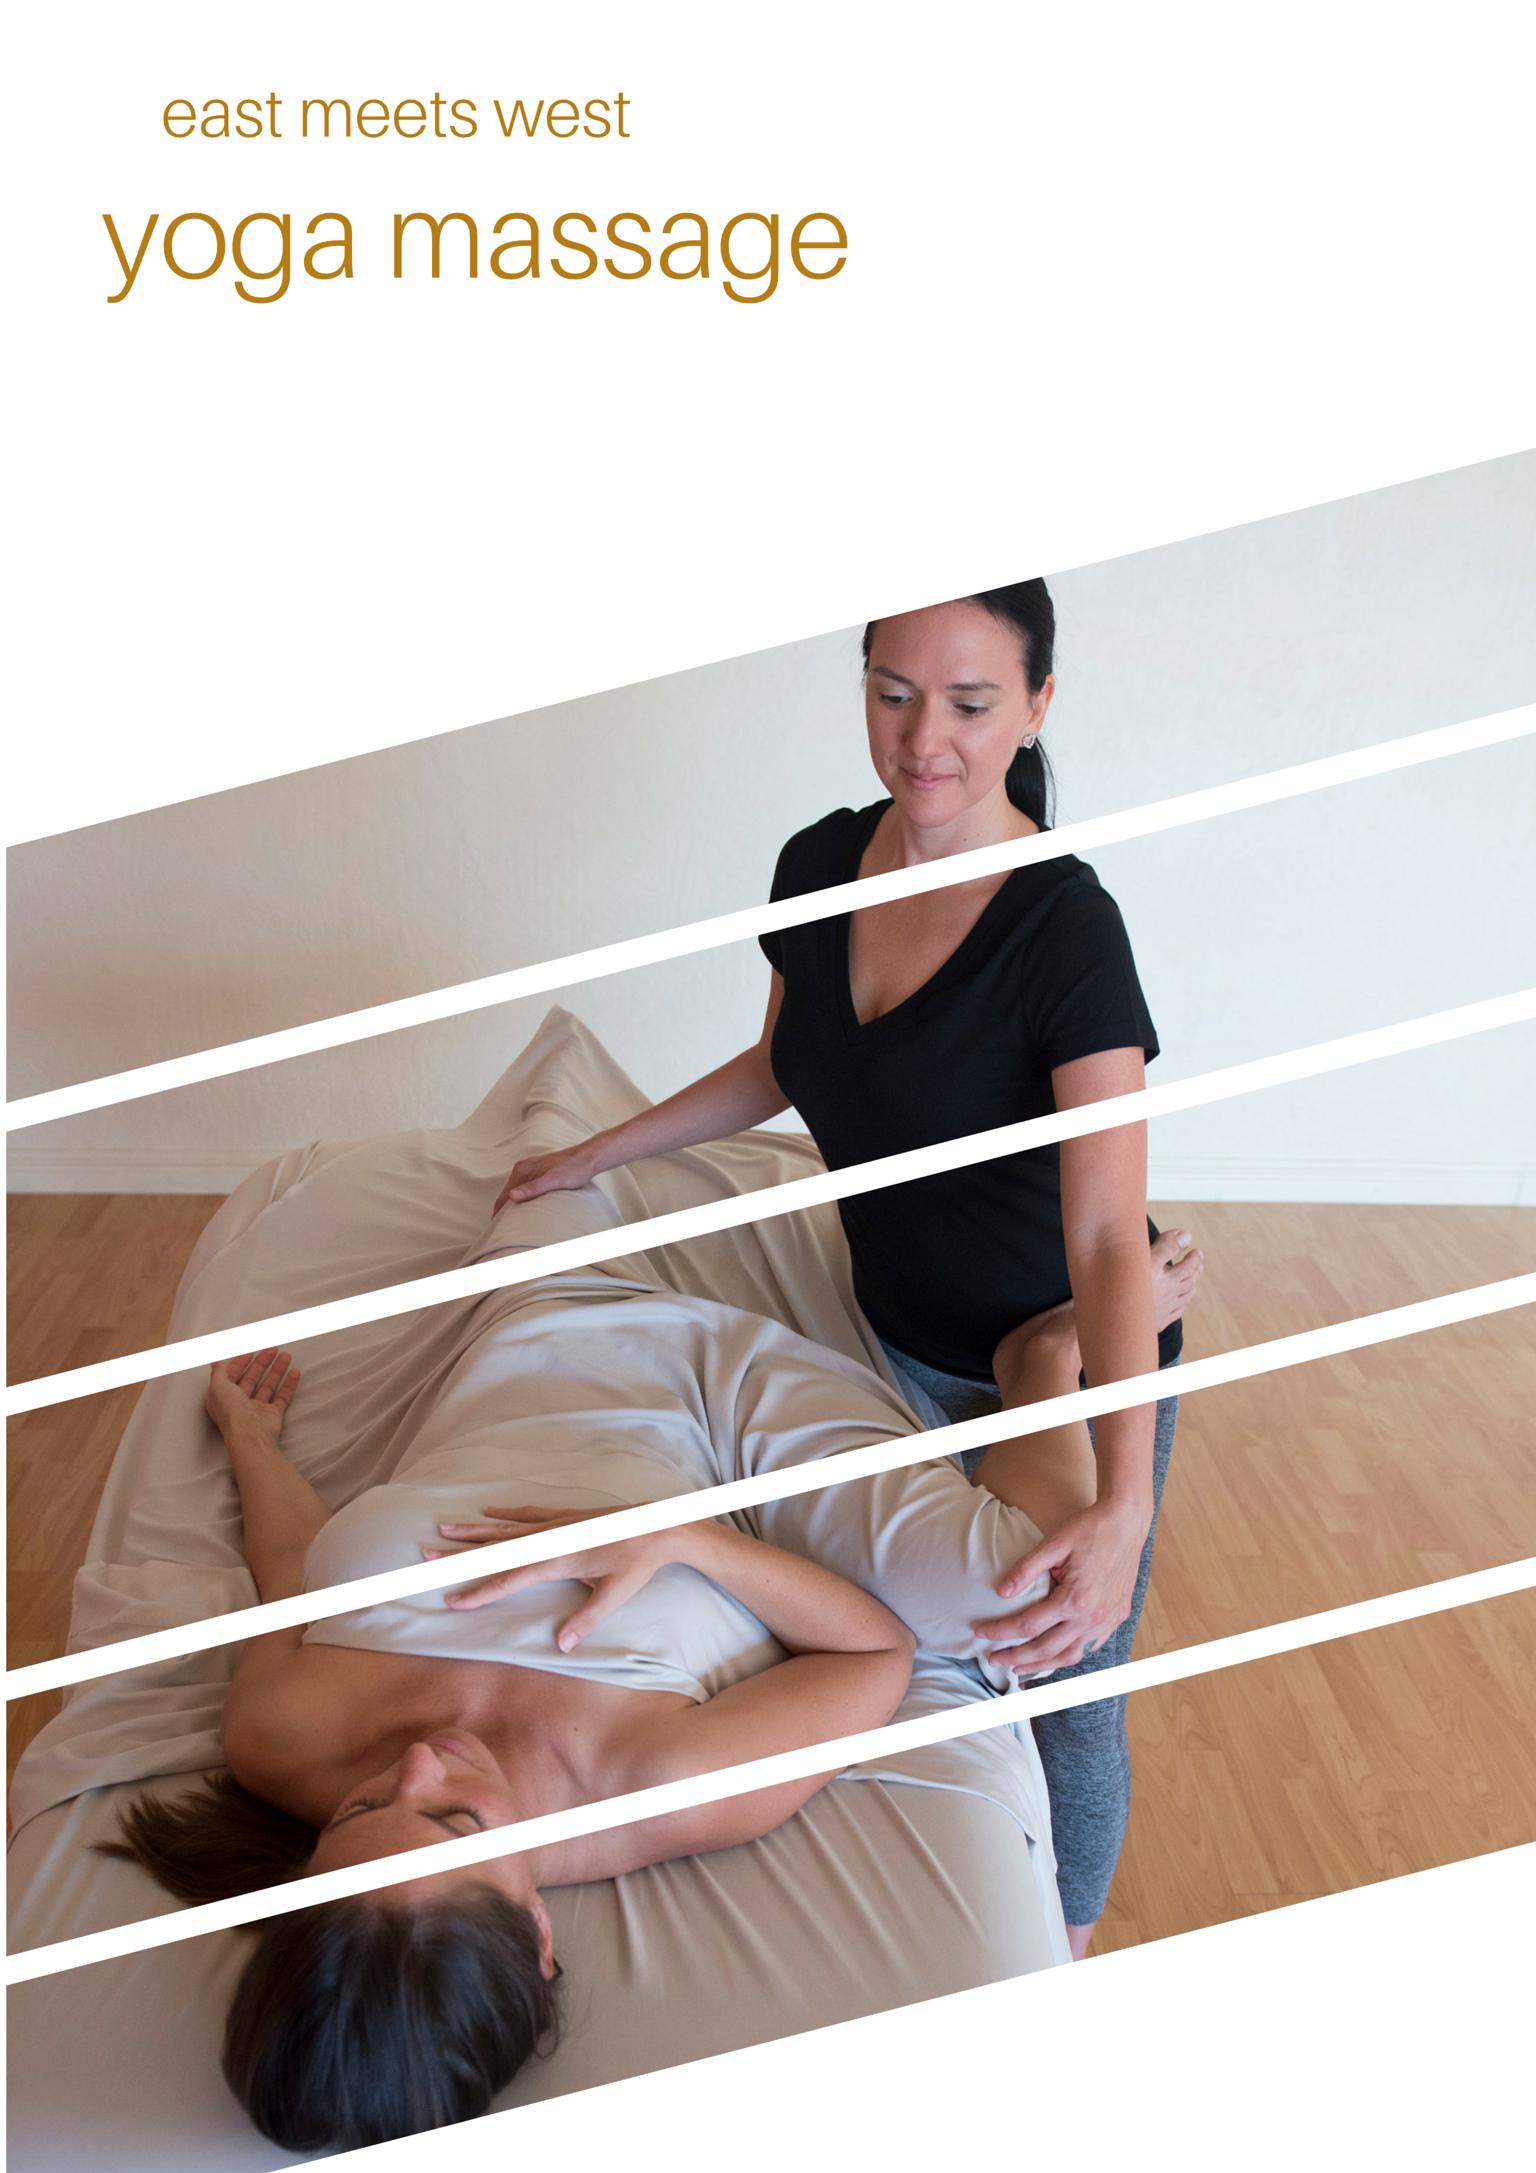 East Meets West: Yoga Massage